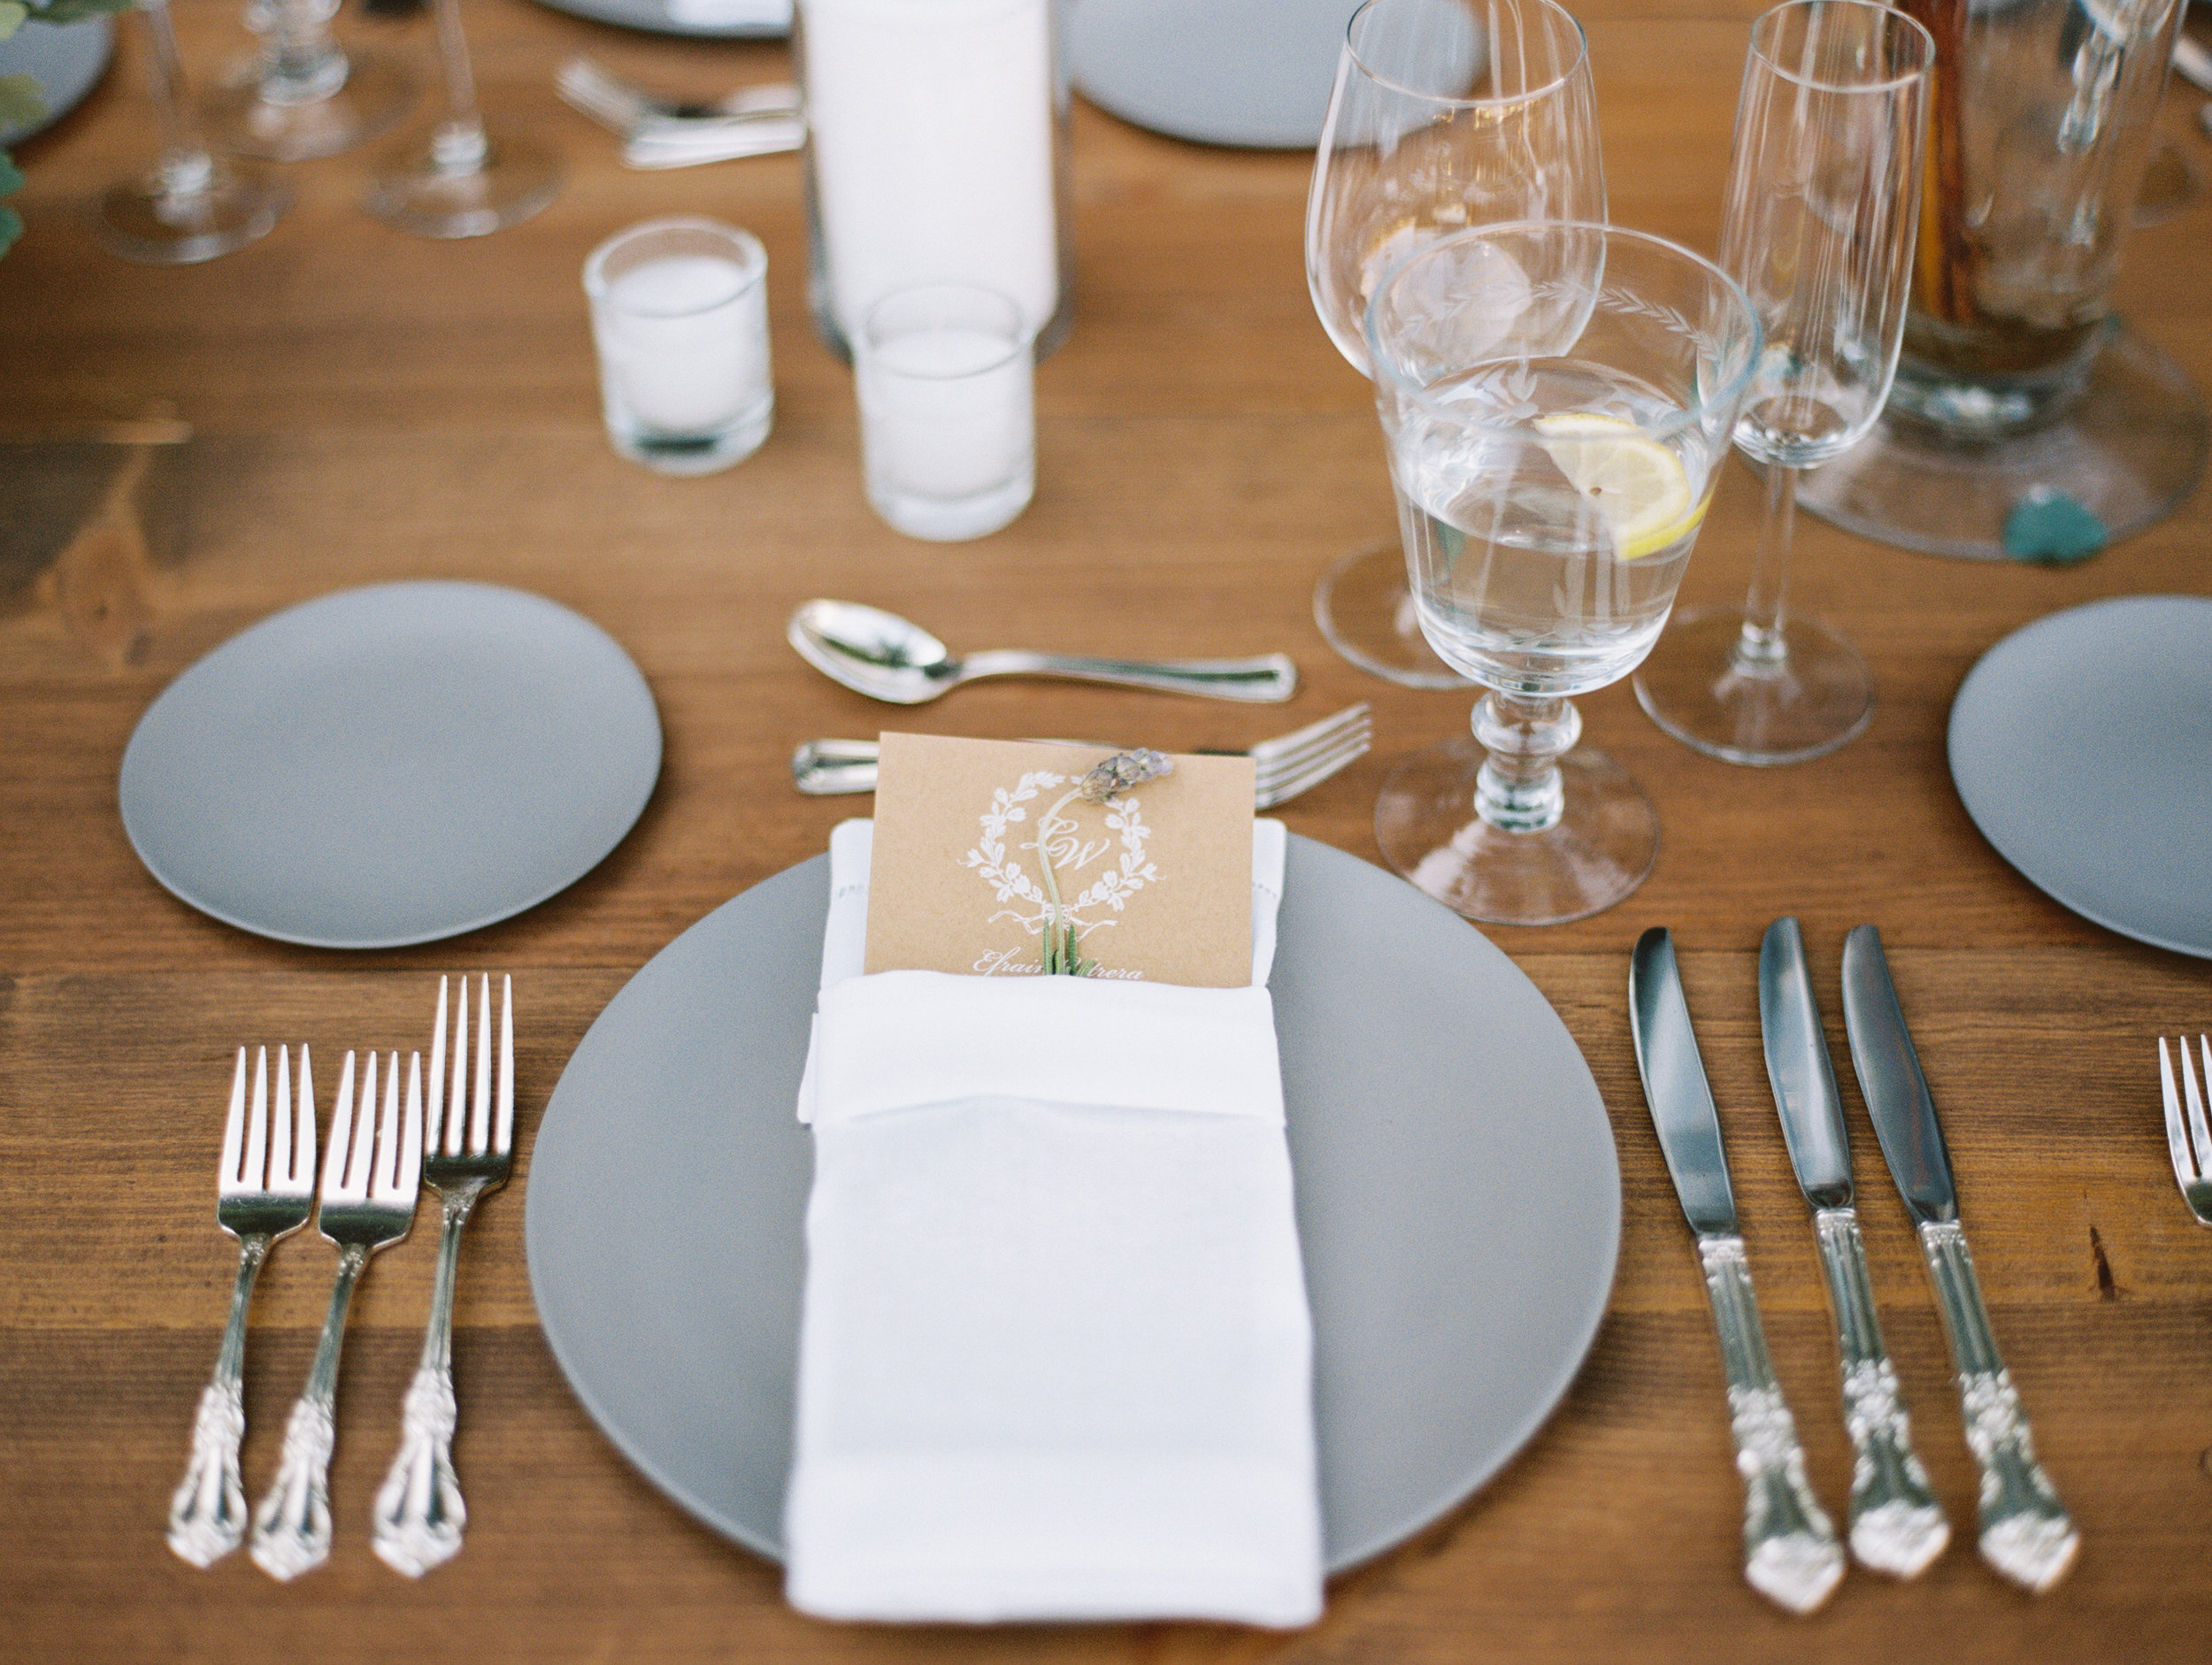 www.santabarbarawedding.com | Pat Moyer Wedding Photography & Films | Santa Barbara Historical Museum | Magnolia Weddings | Camiella Floral Designs | Table Setting